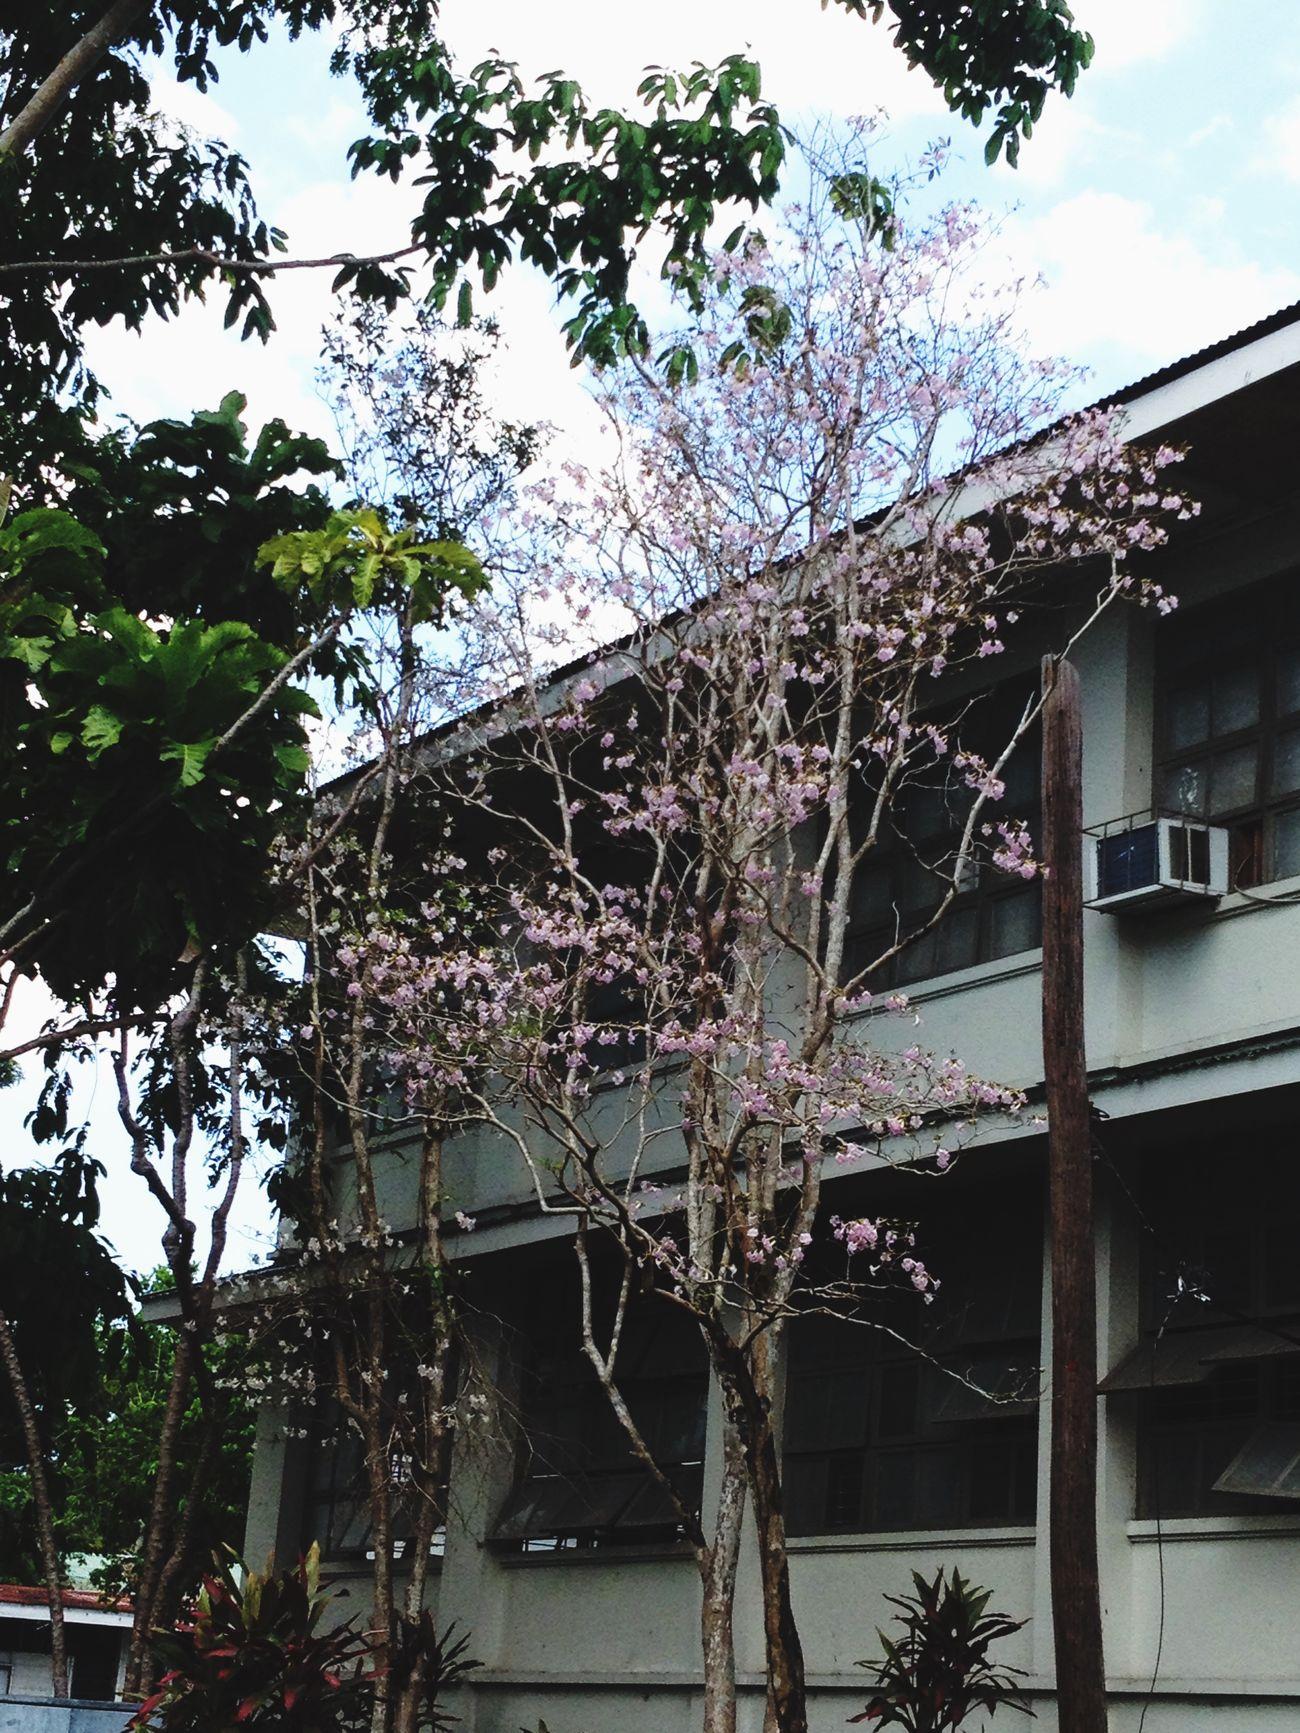 Like cherry blossoms 🌸🌸